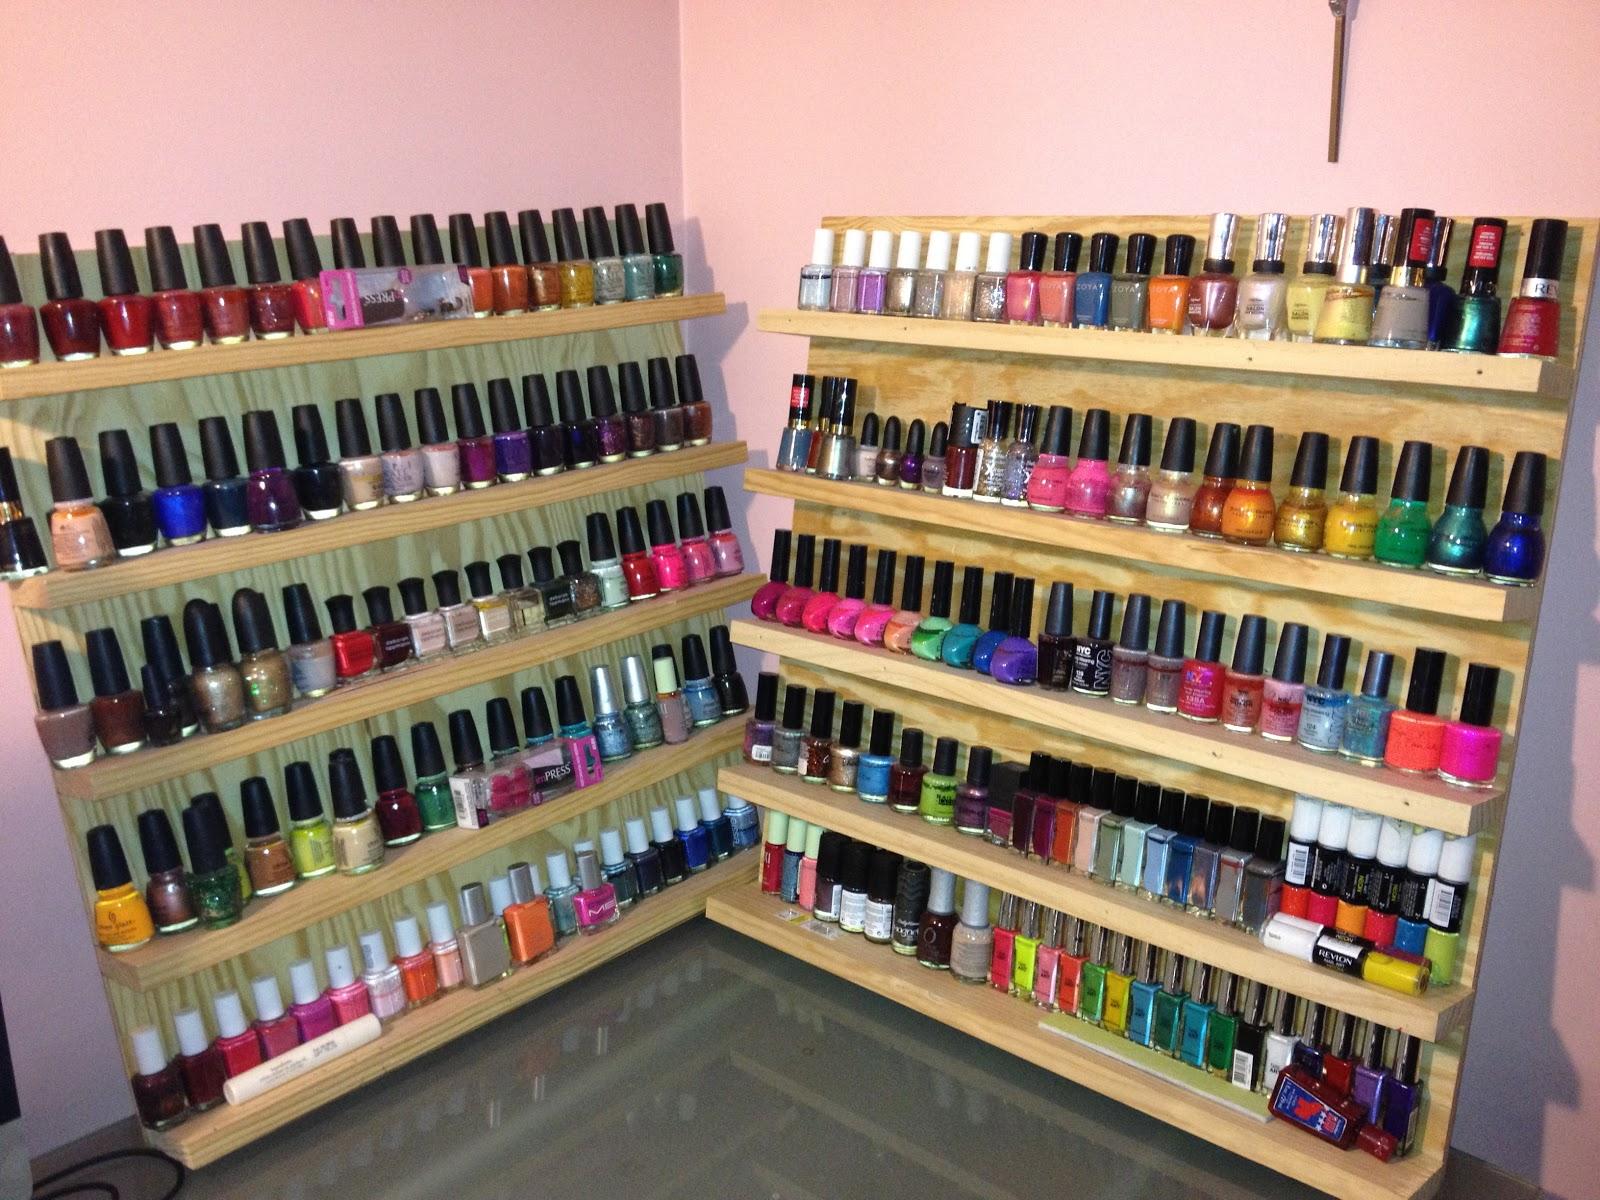 January 2013 heard it through the irvine up against the wall the two nail polish racks solutioingenieria Gallery